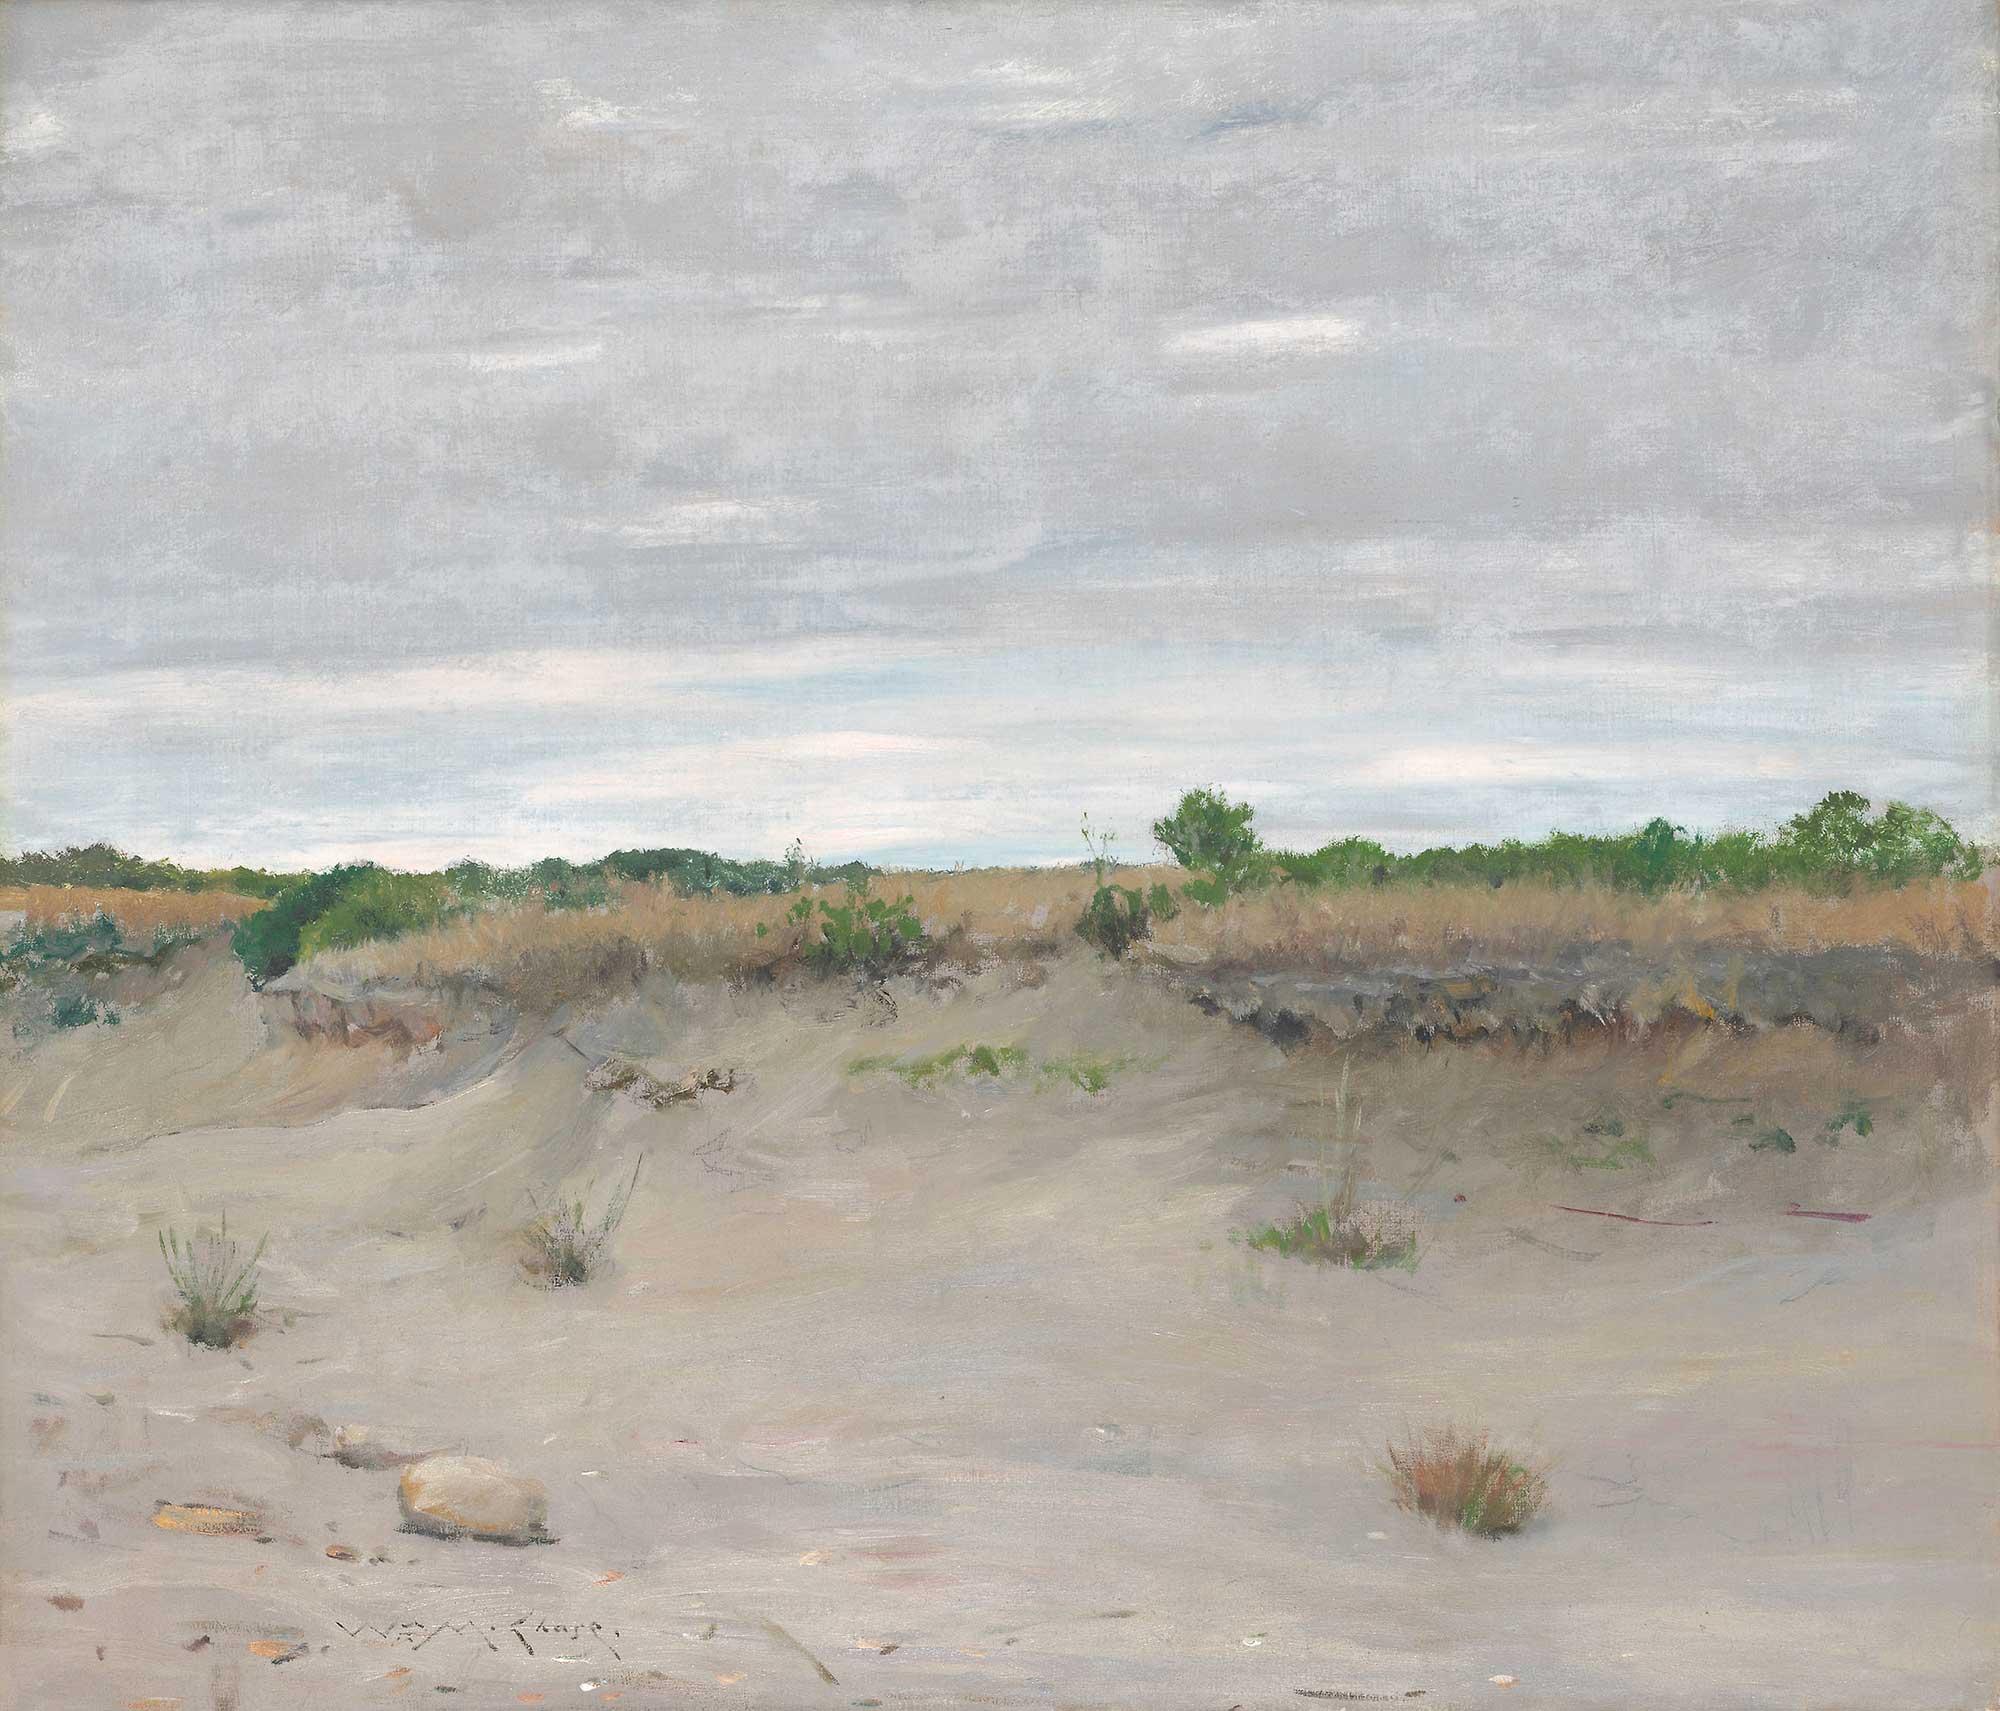 William Merritt Chase Kumları Savuran Rüzgar, Shinnecock